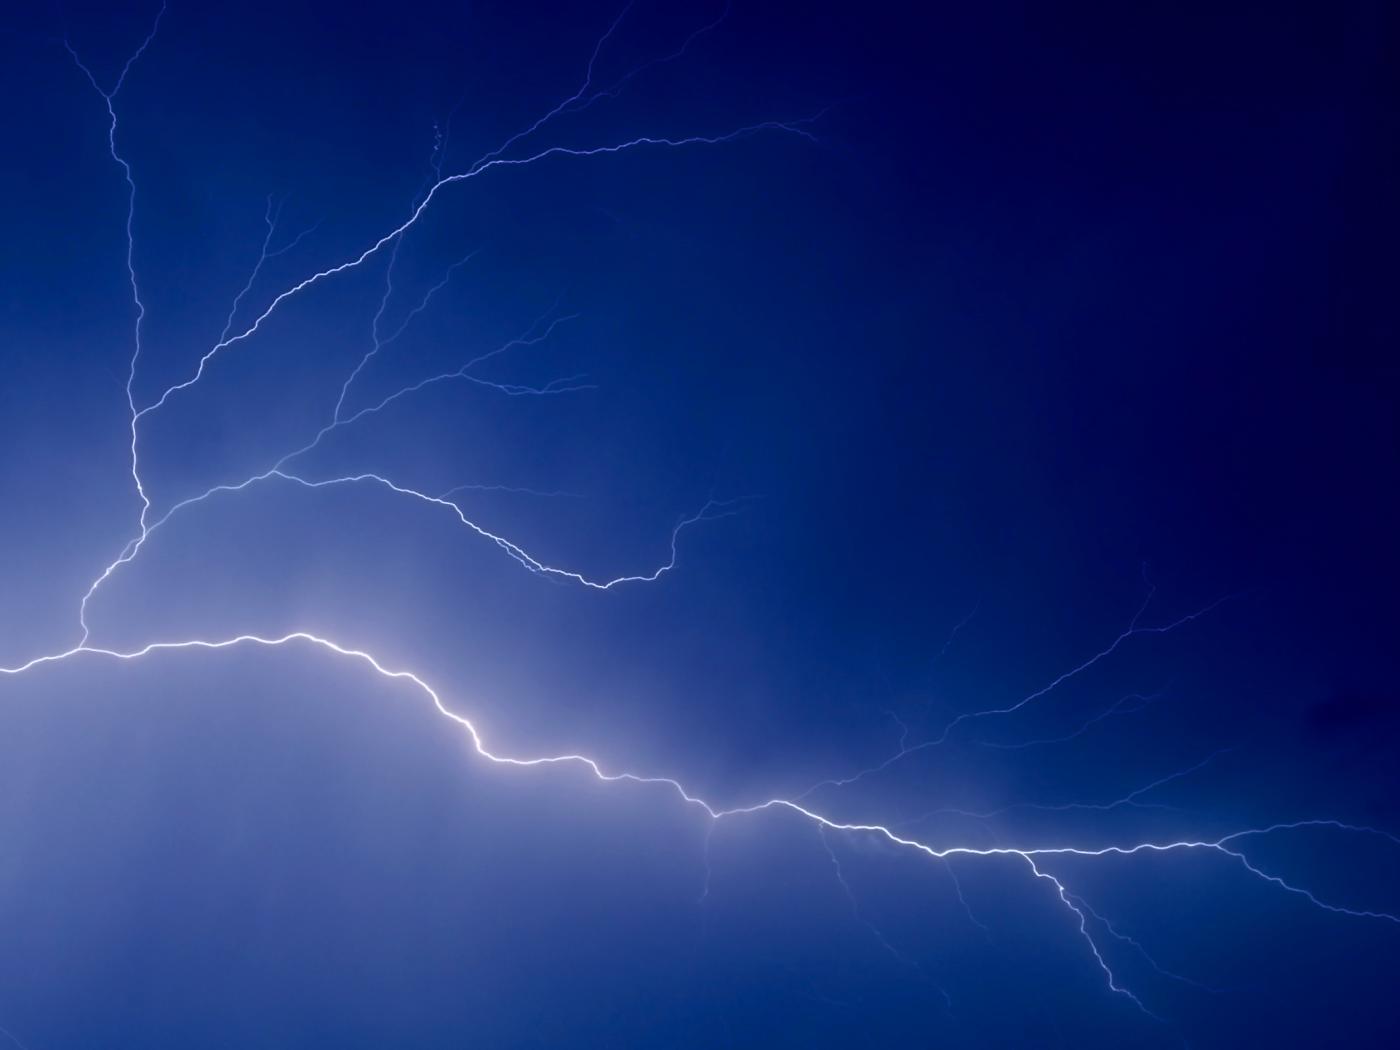 http://2.bp.blogspot.com/-IhWKPBk7QgA/TdOp68Wt72I/AAAAAAAAEJE/SfzYo8_wl5k/s1600/lightning-wallpaper-2.jpg